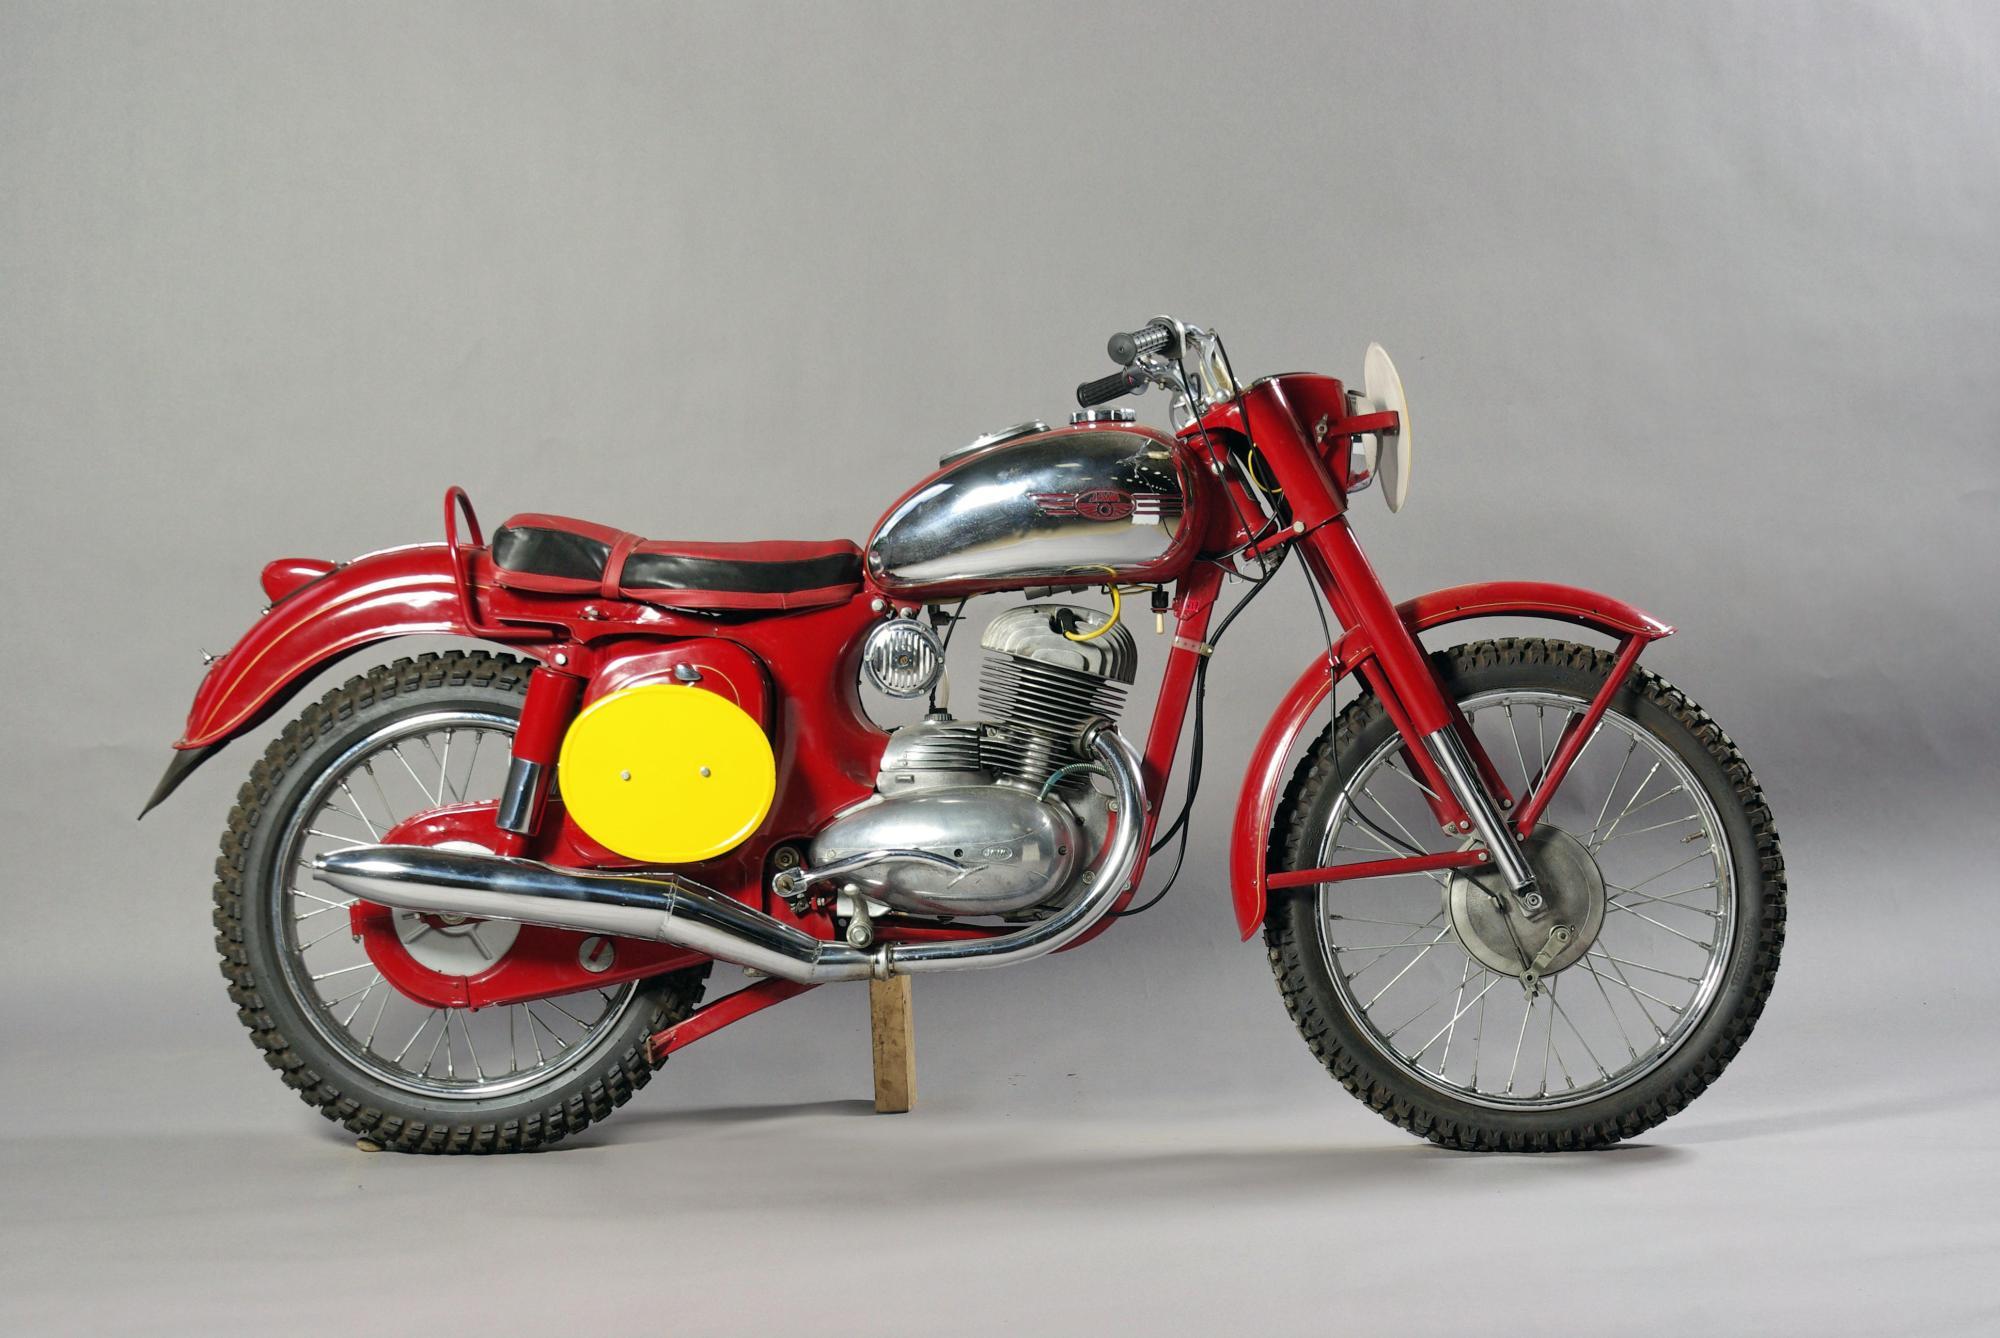 hight resolution of 1961 jawa 250cc type 553 isdt